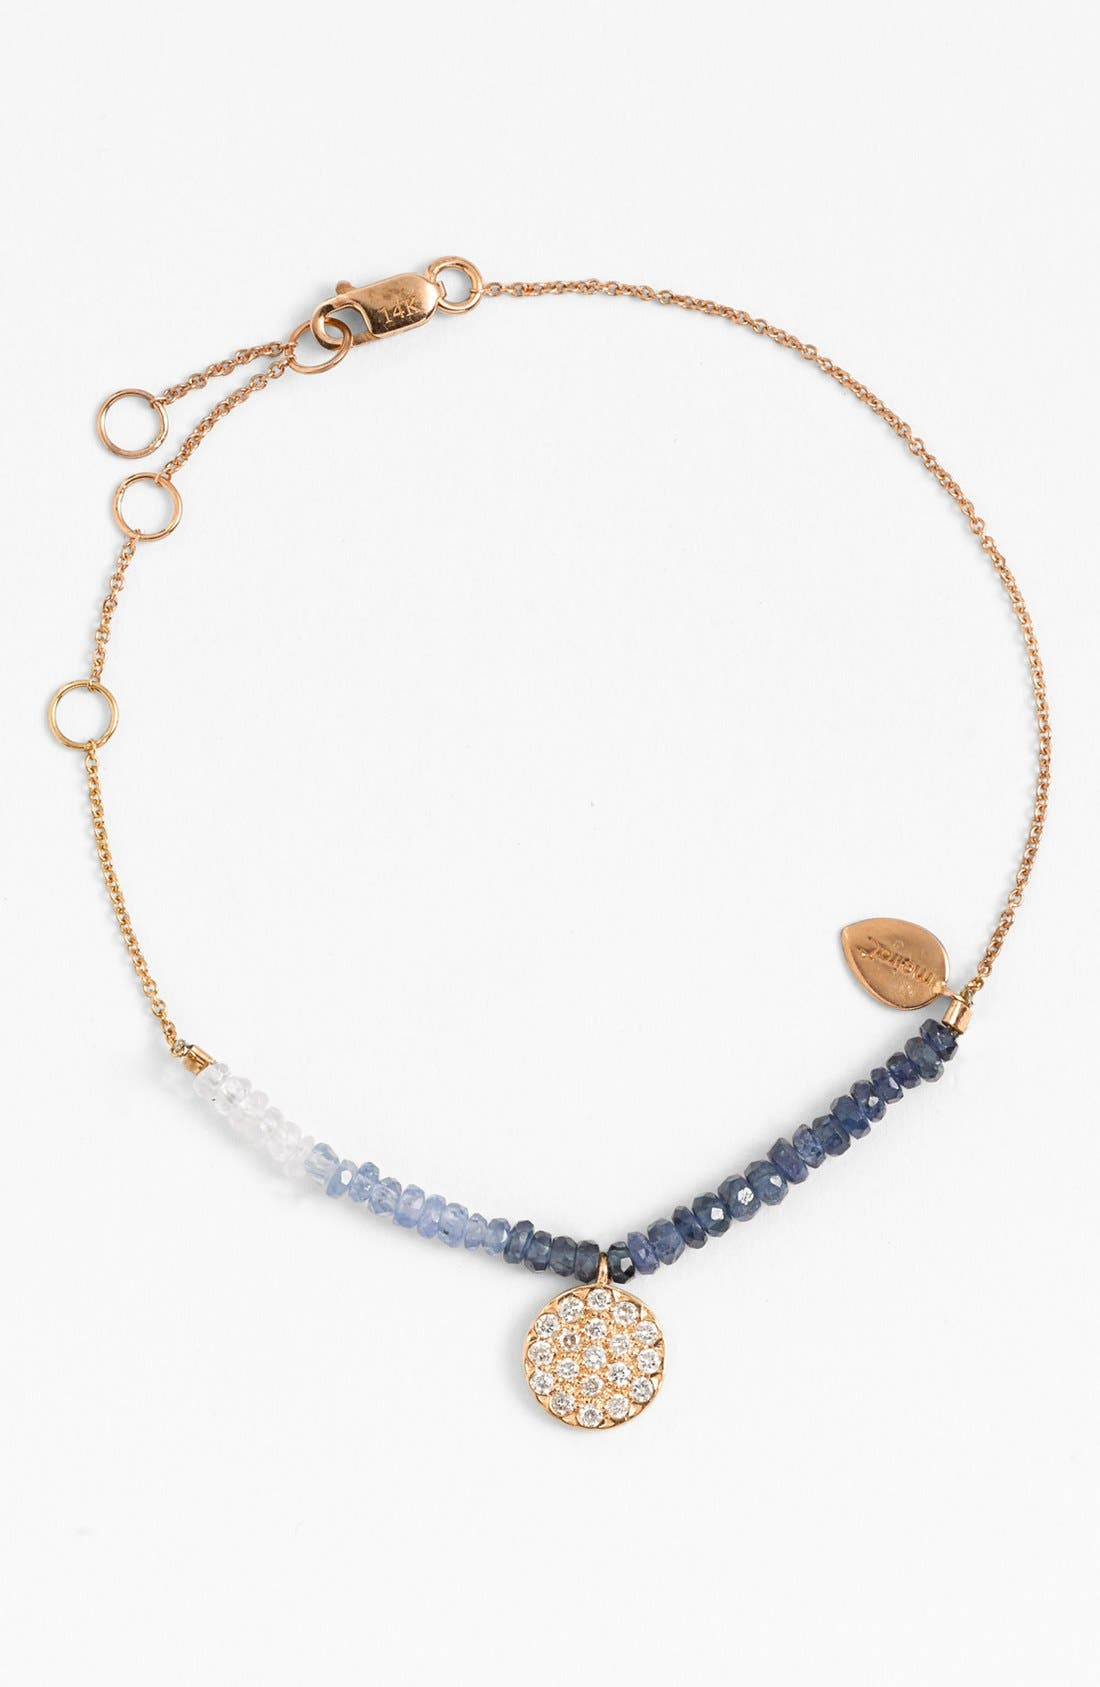 Alternate Image 1 Selected - MeiraT 'Dazzling' Diamond & Sapphire Bracelet